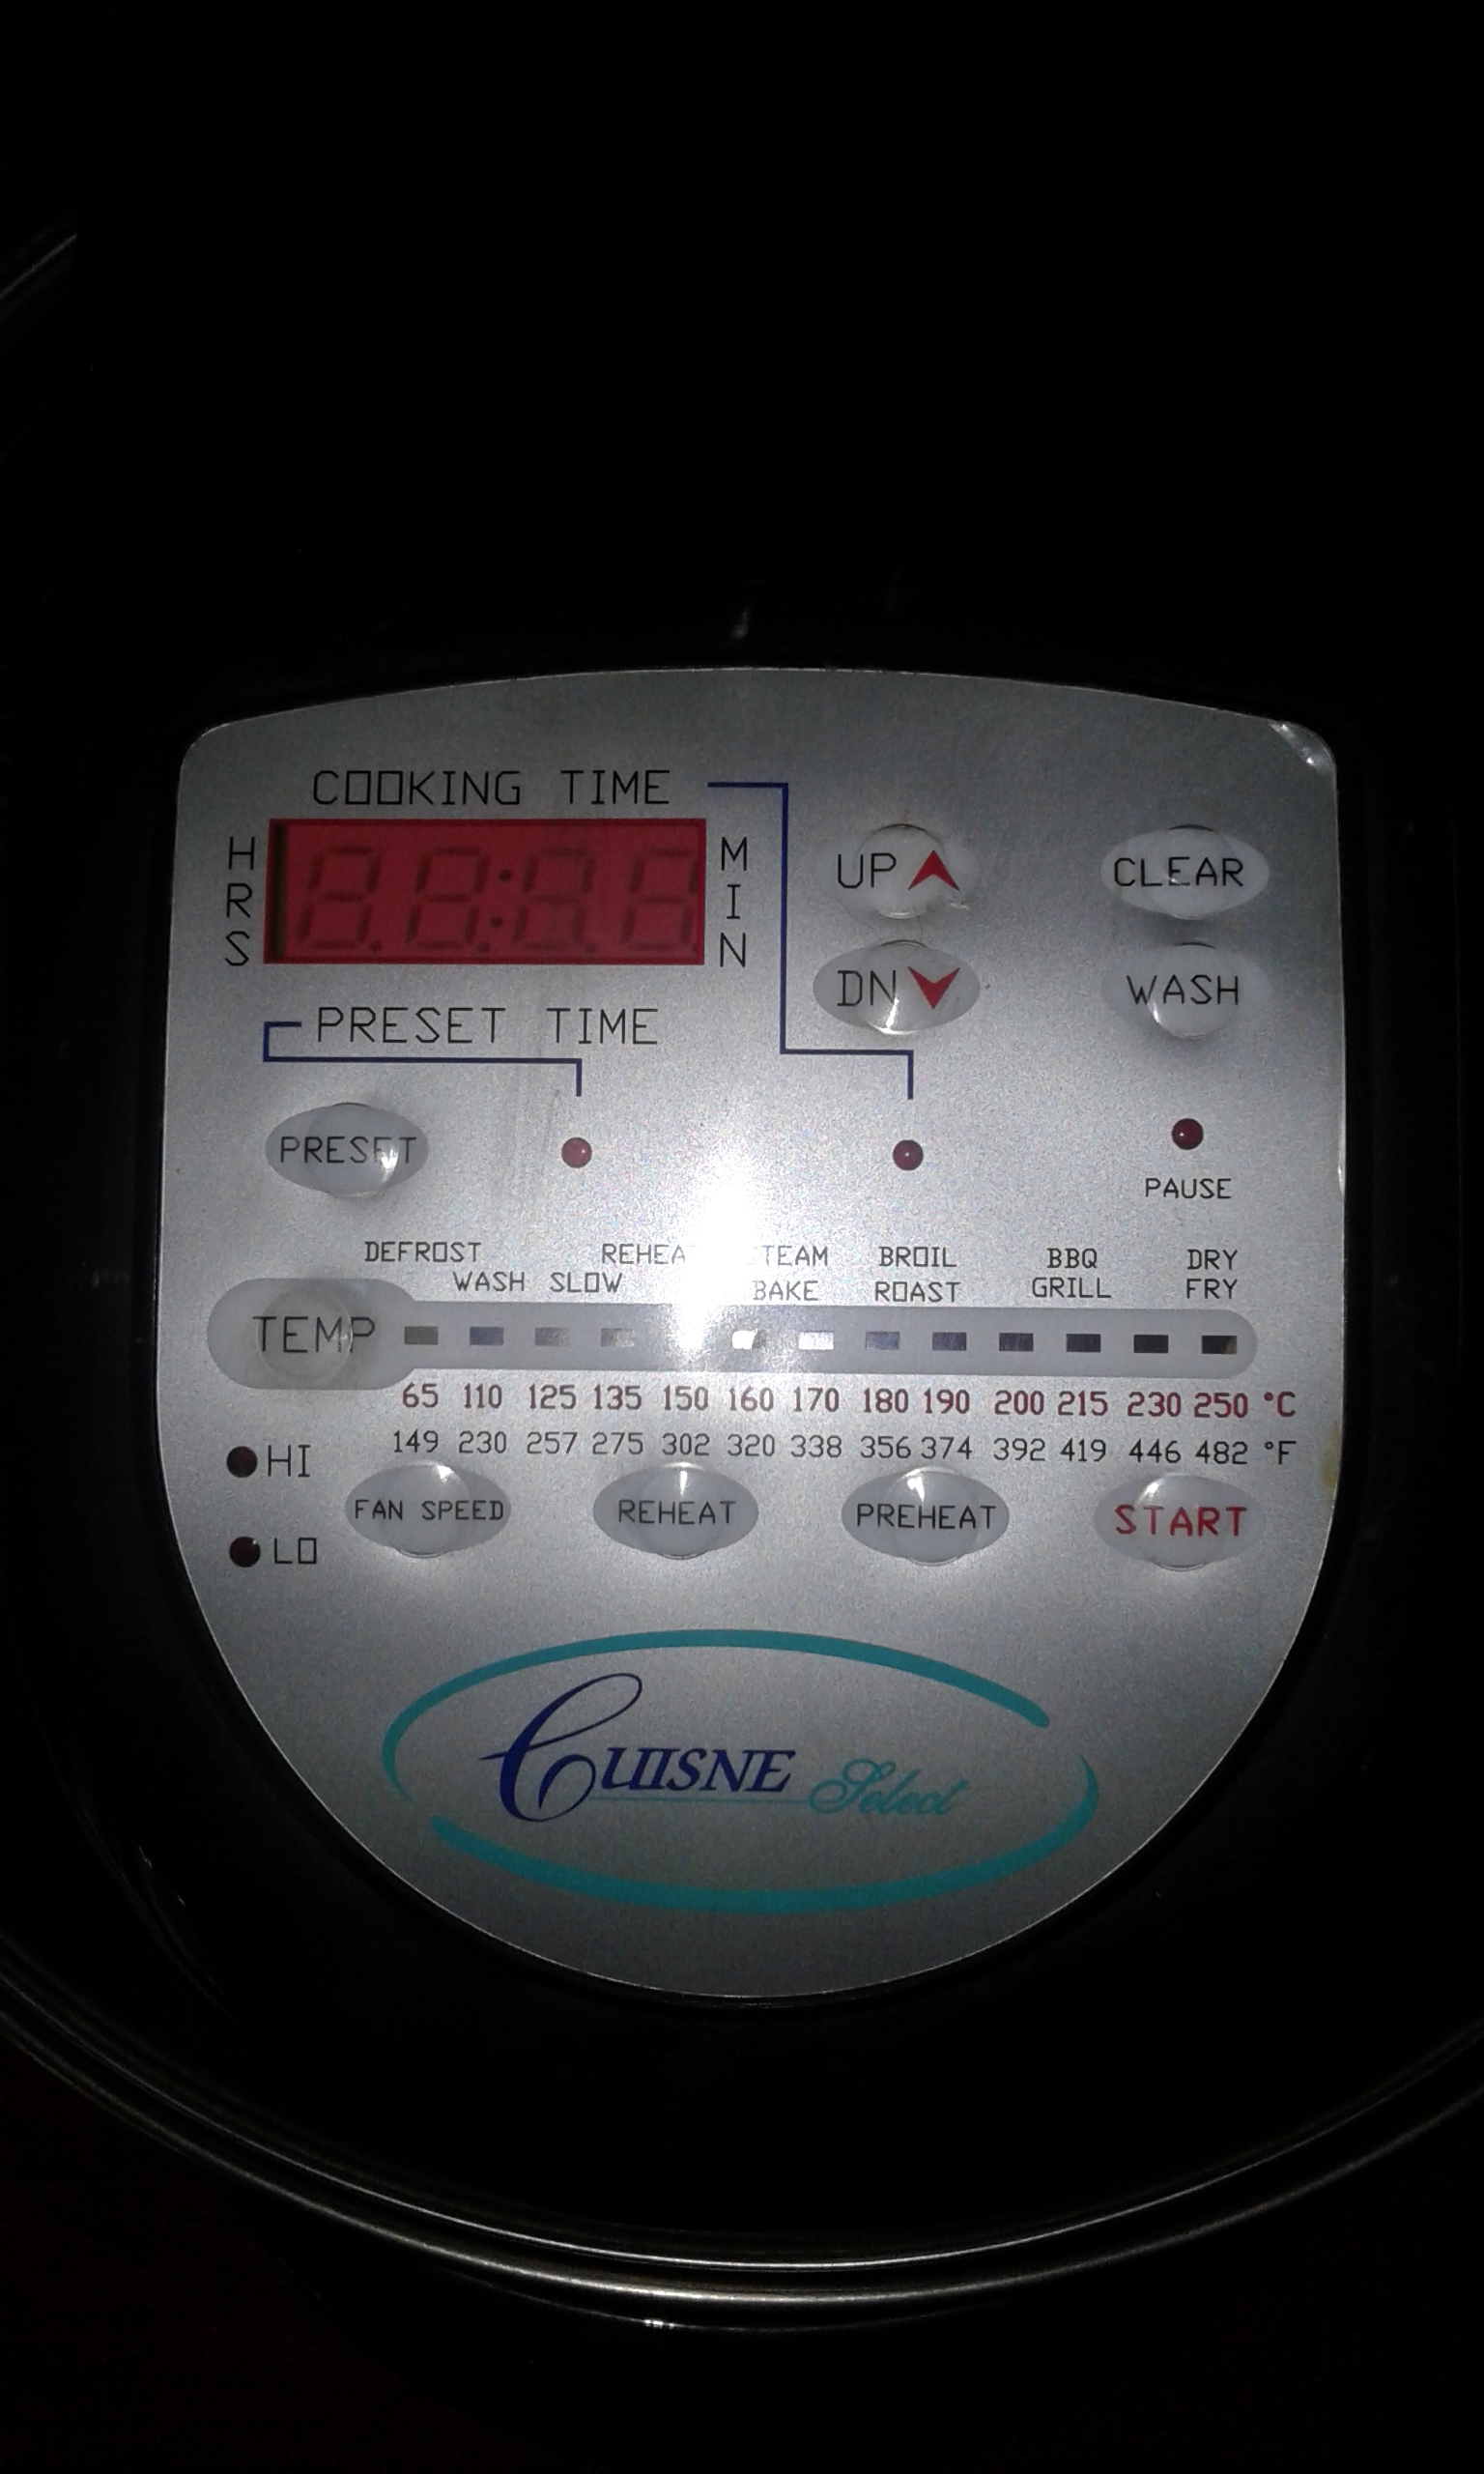 Cuisine Select Convection Air Fryer Oven